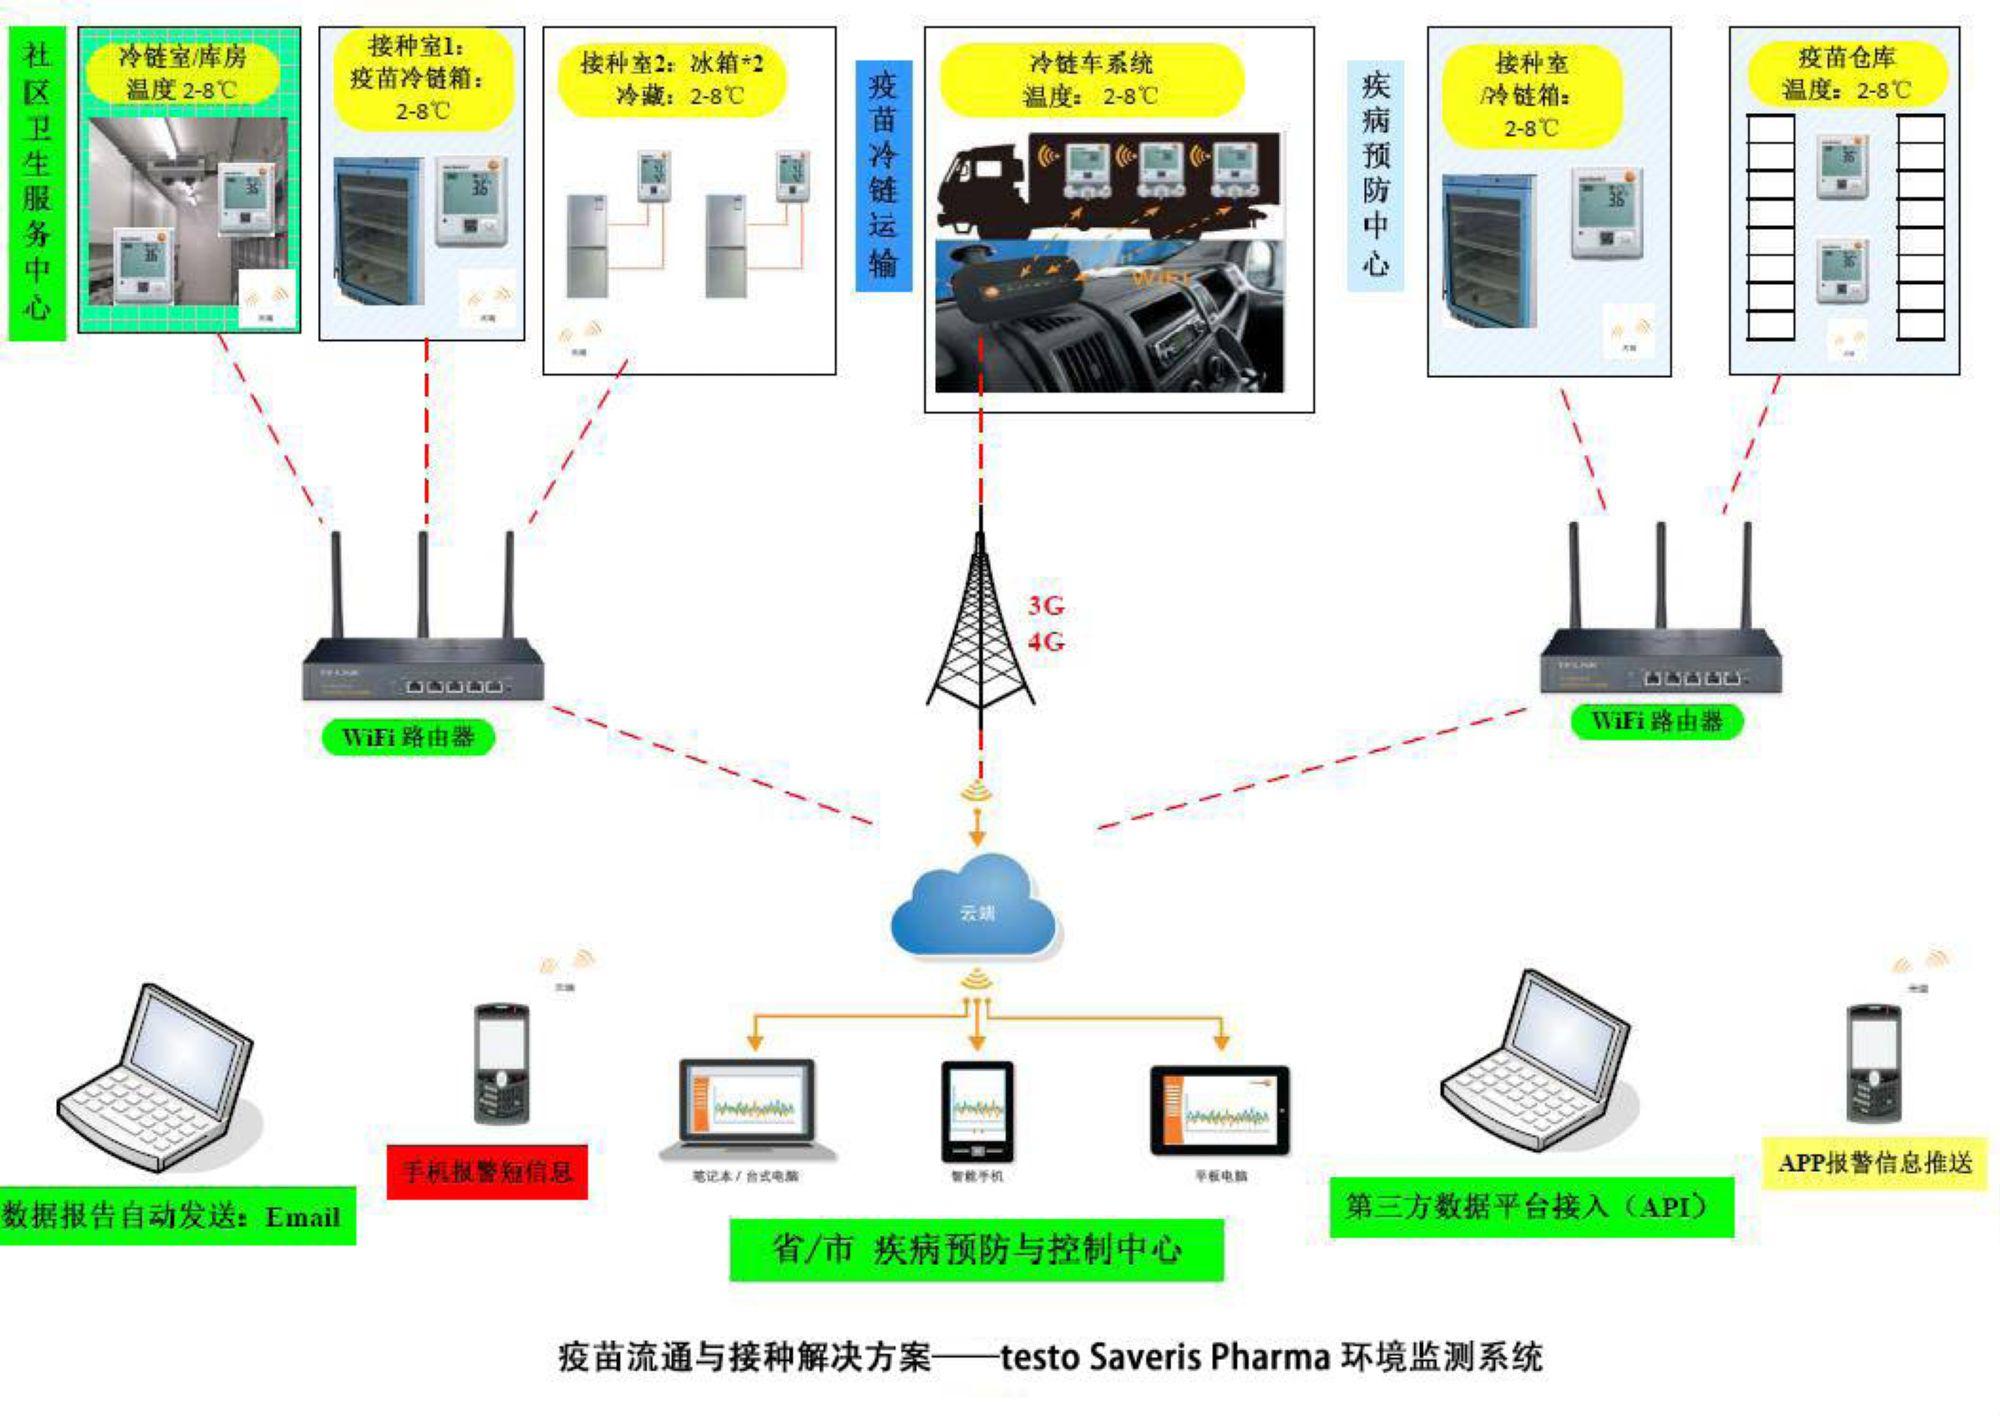 testo Saveris仓储/冷链温度监测系统